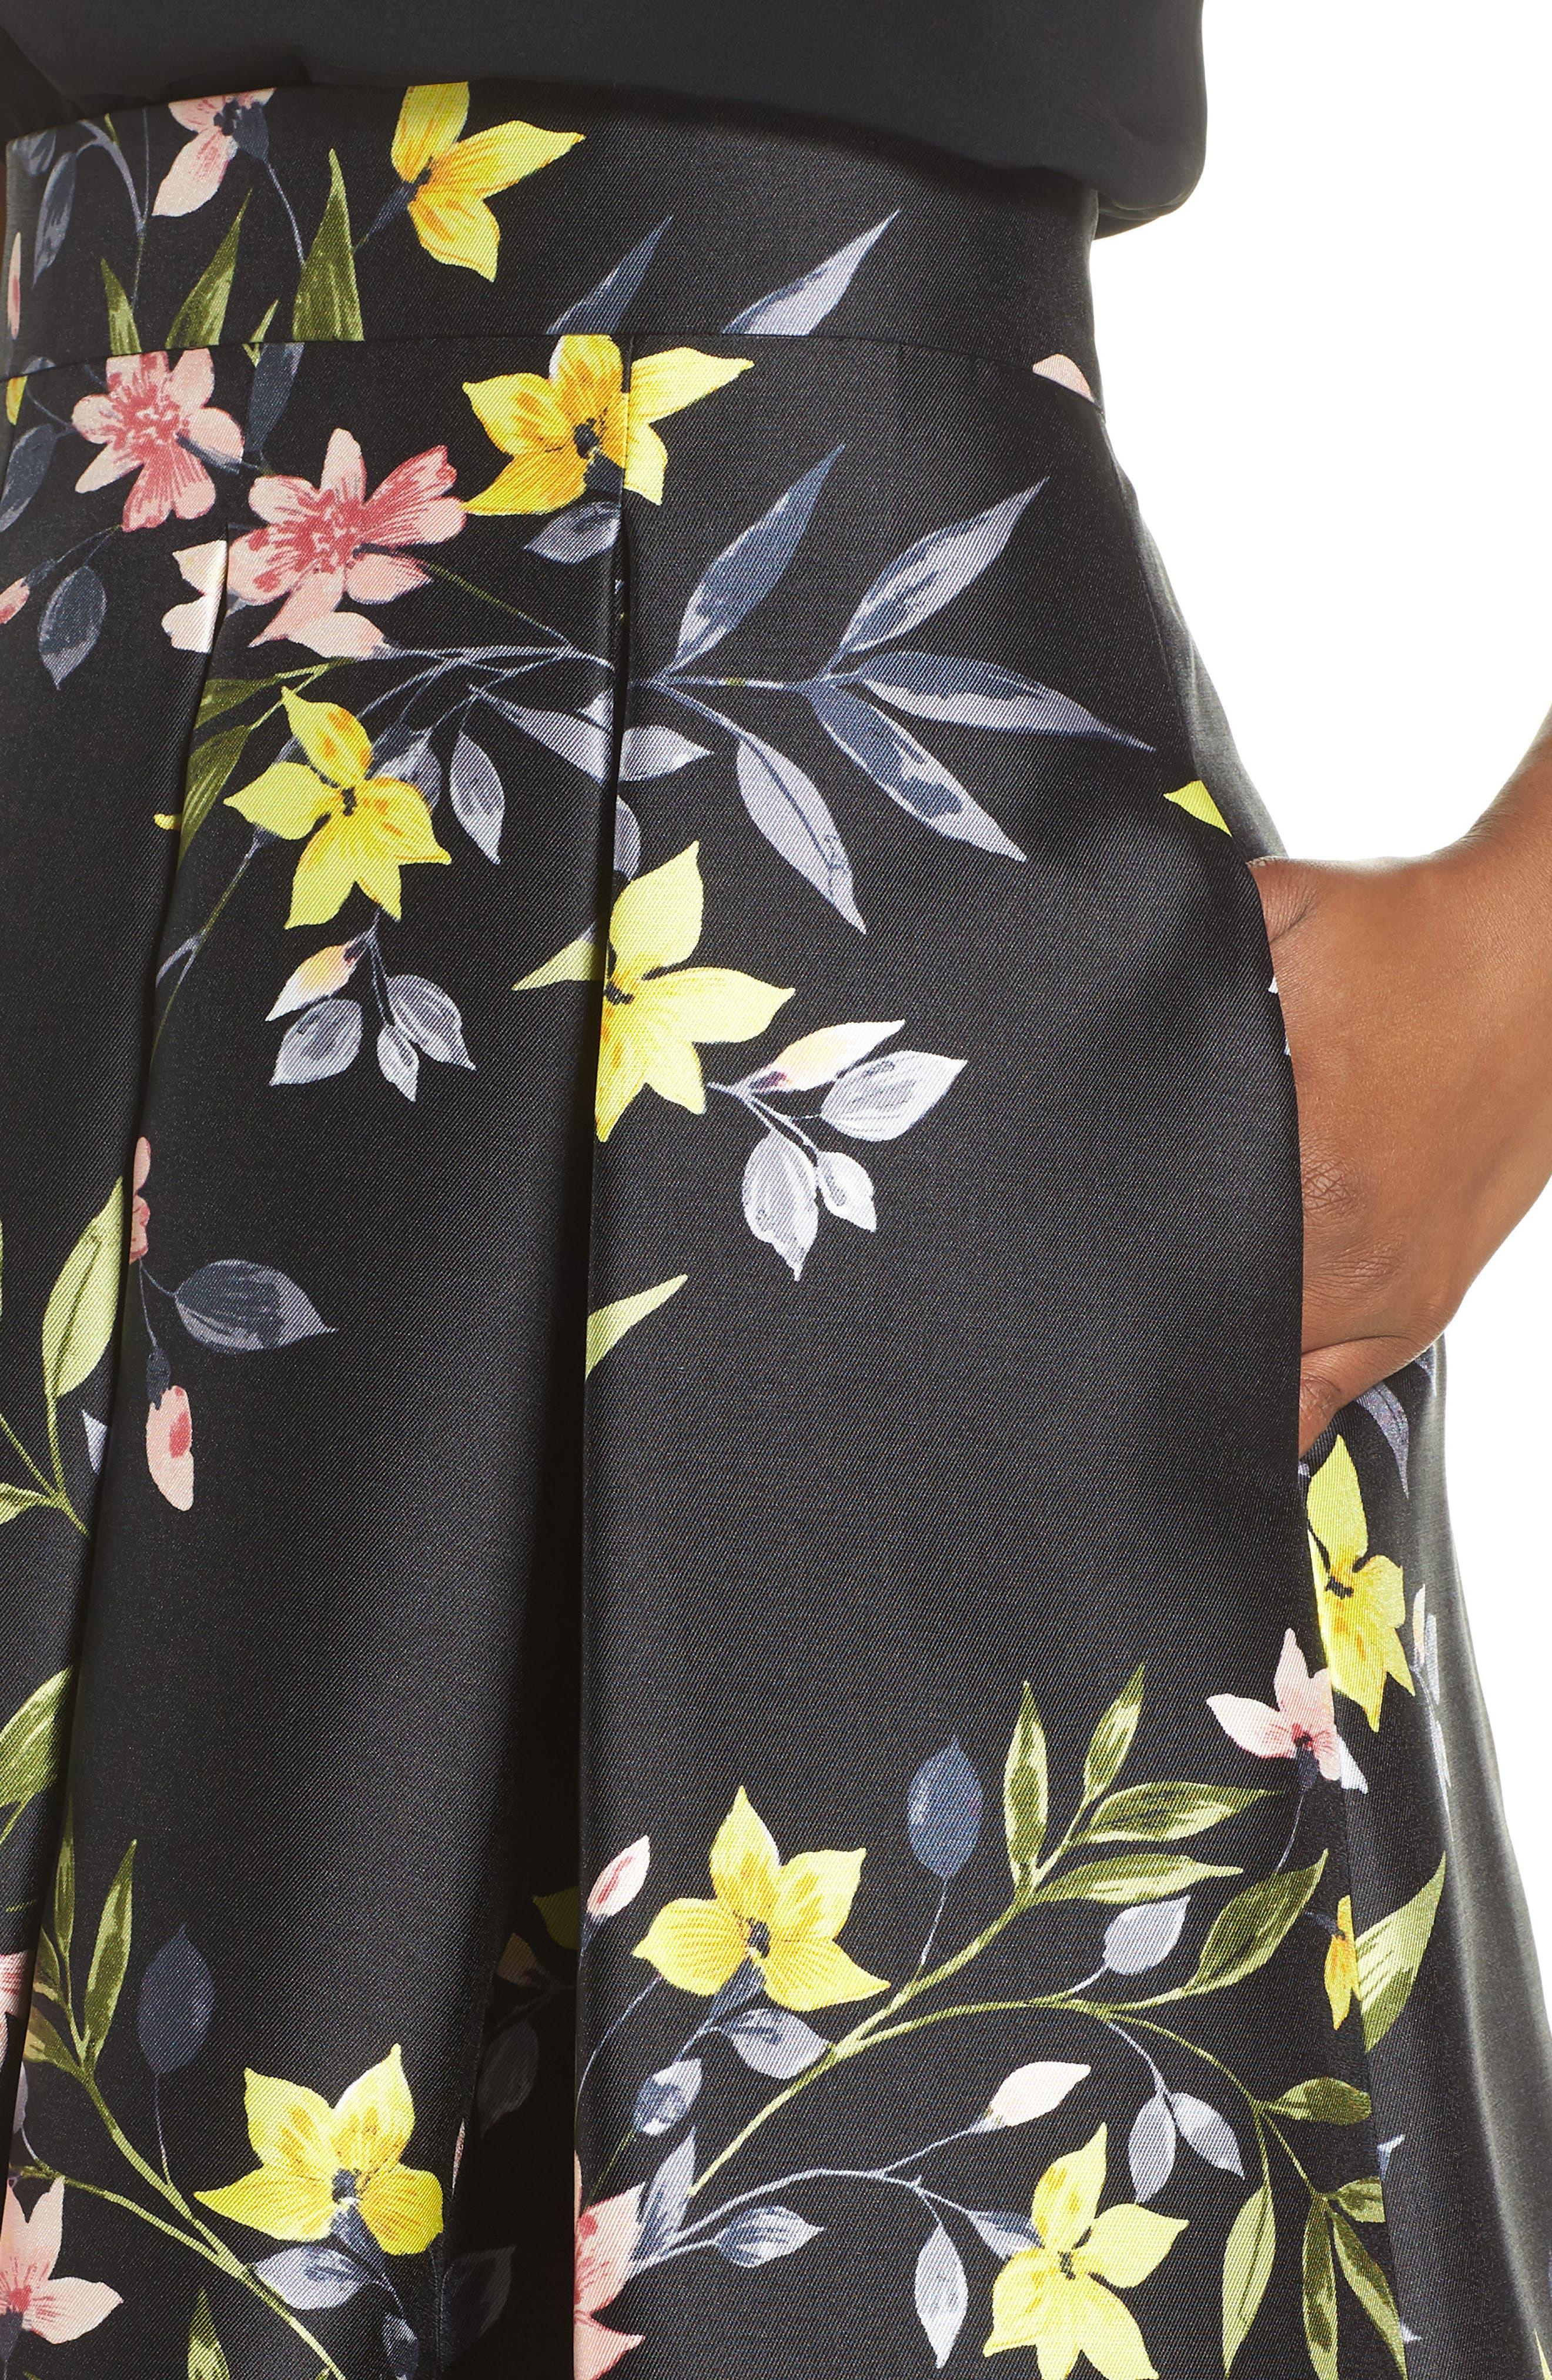 Floral A-Line Skirt,                             Alternate thumbnail 4, color,                             001